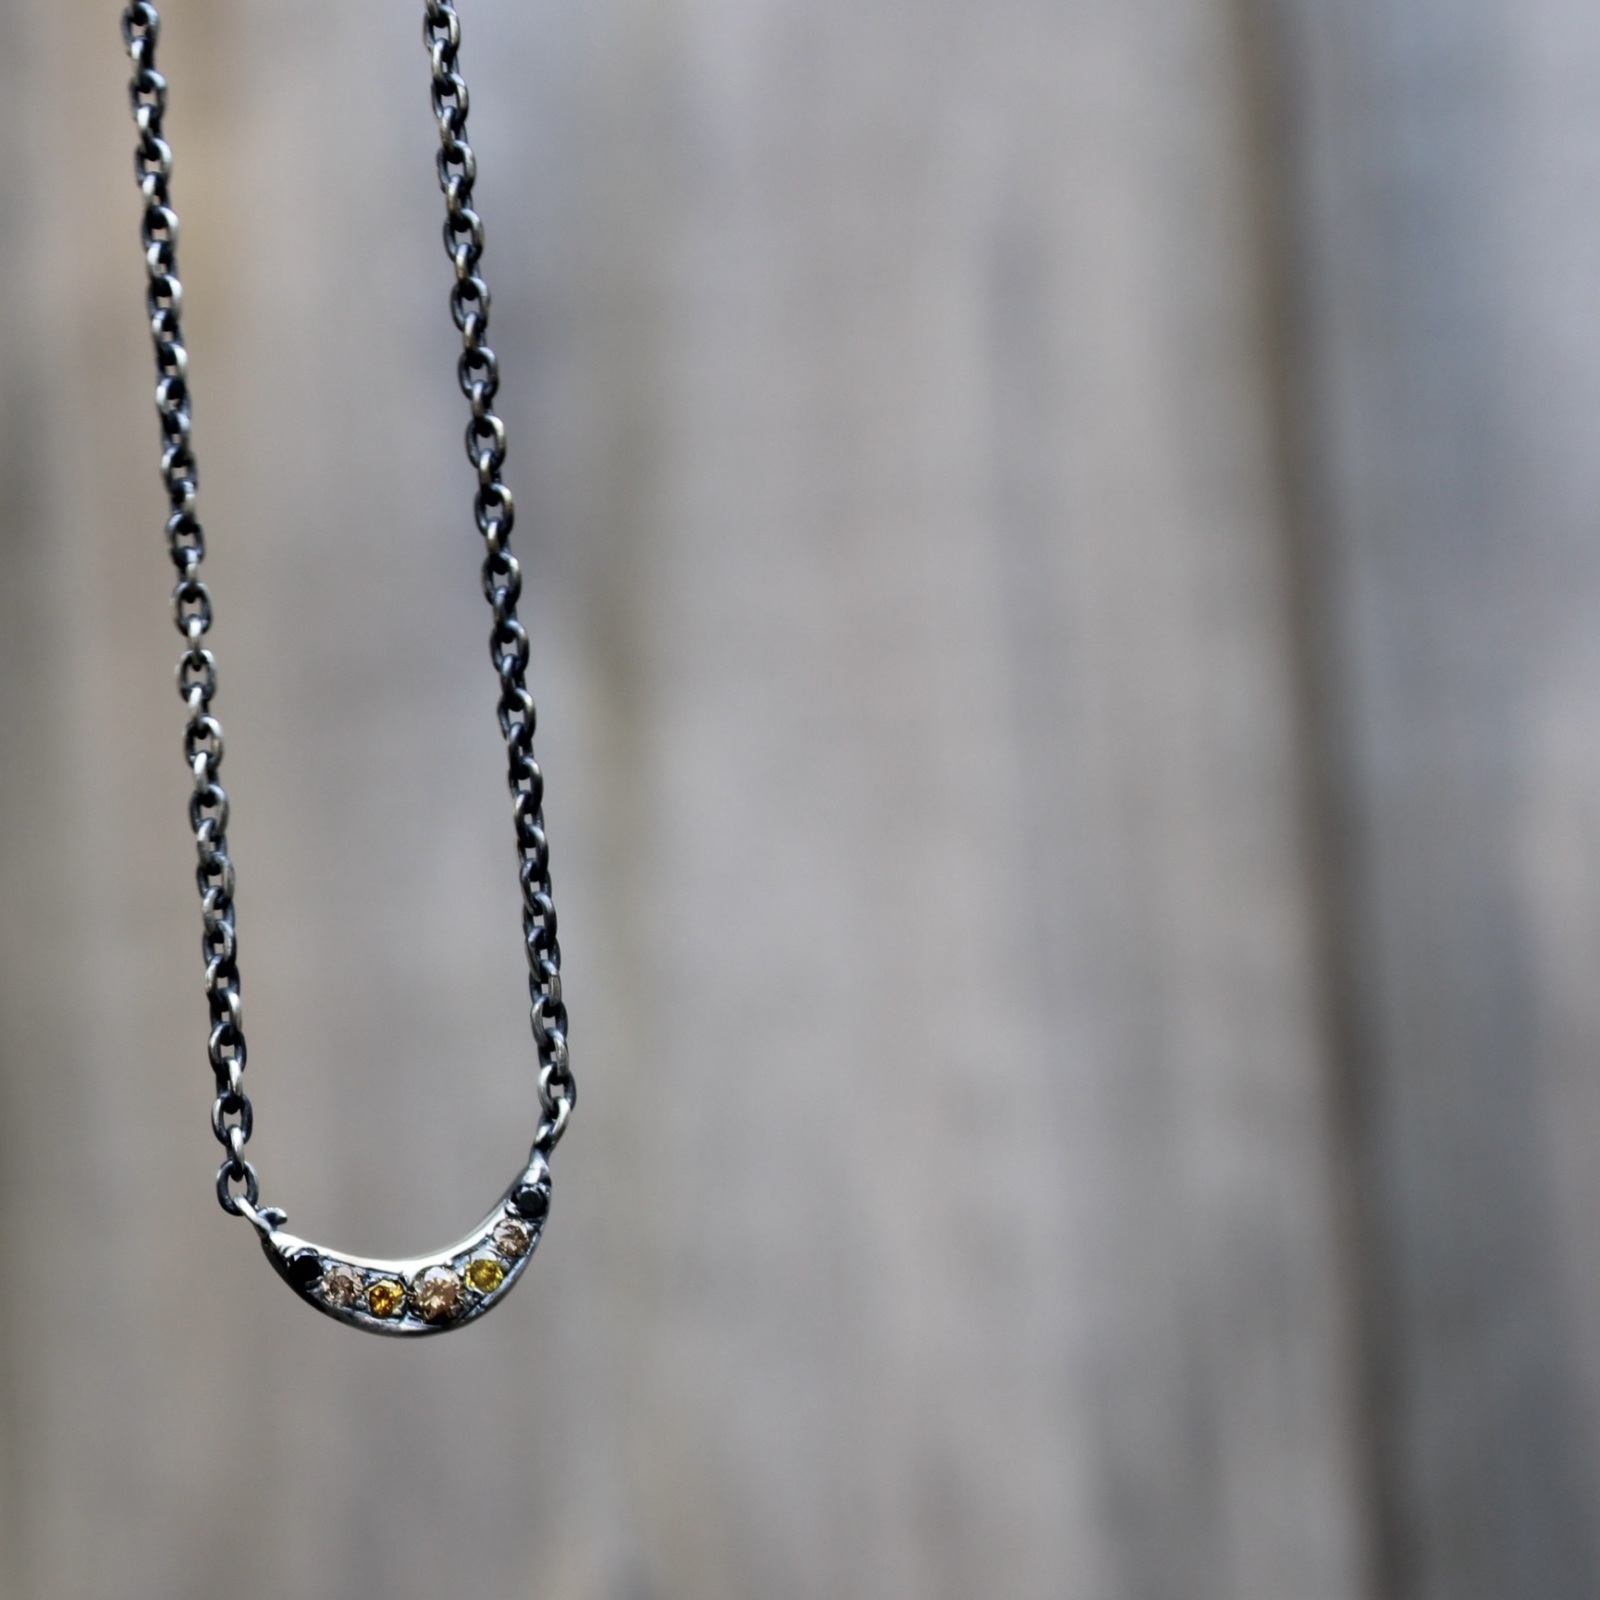 Rustic Silver Mini Moon Necklace